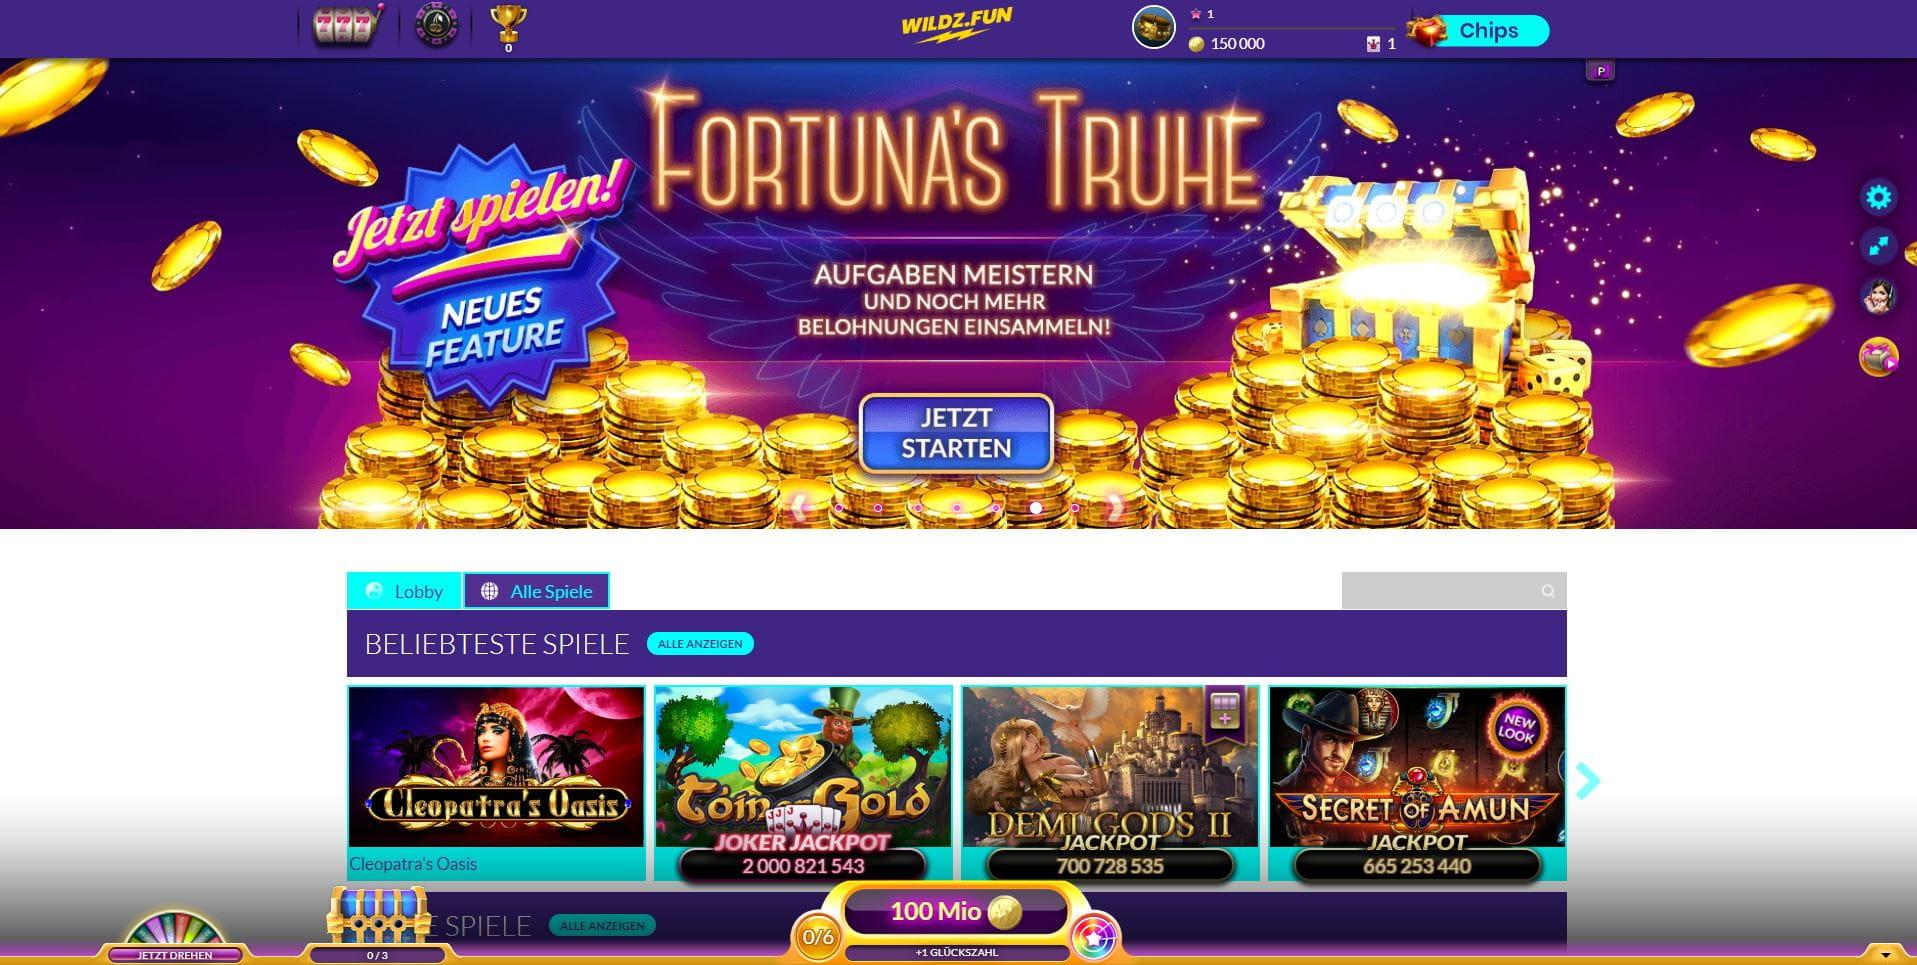 spielautomaten verbot in gaststätten an feiertagen hessen